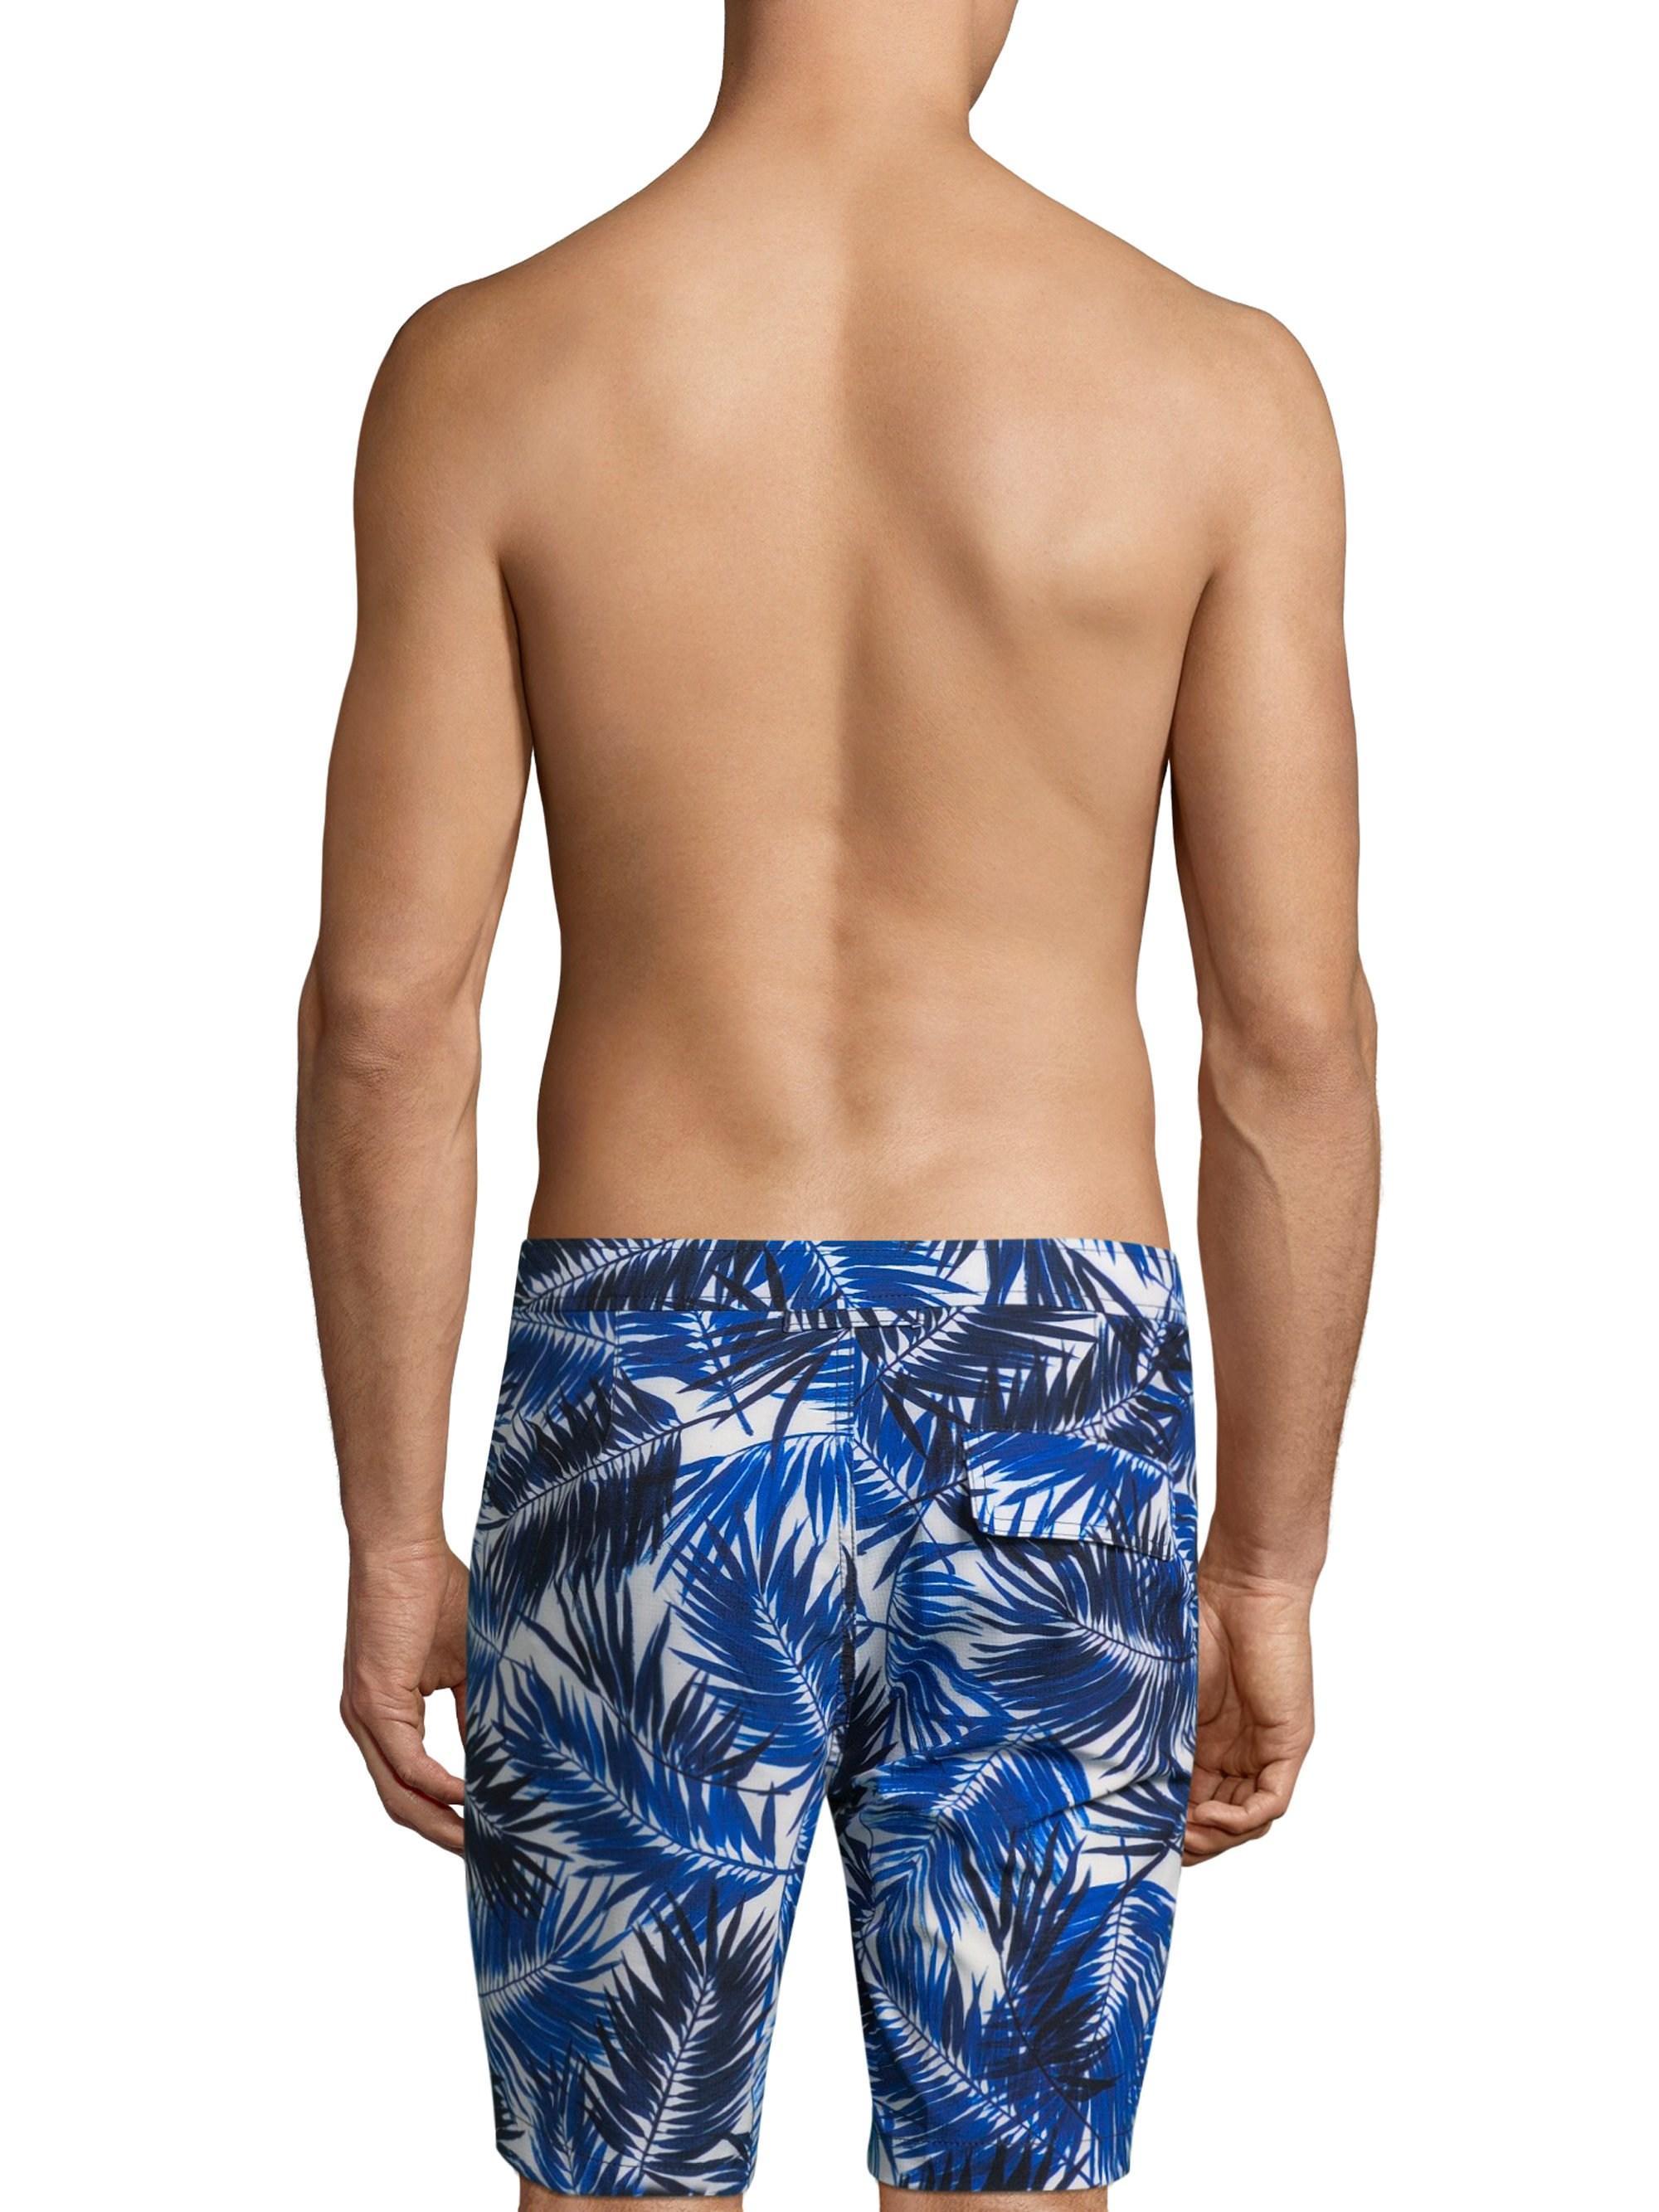 61c67fecf4 Lyst - Onia Brushed Palm Calder Swim Trunks in Blue for Men